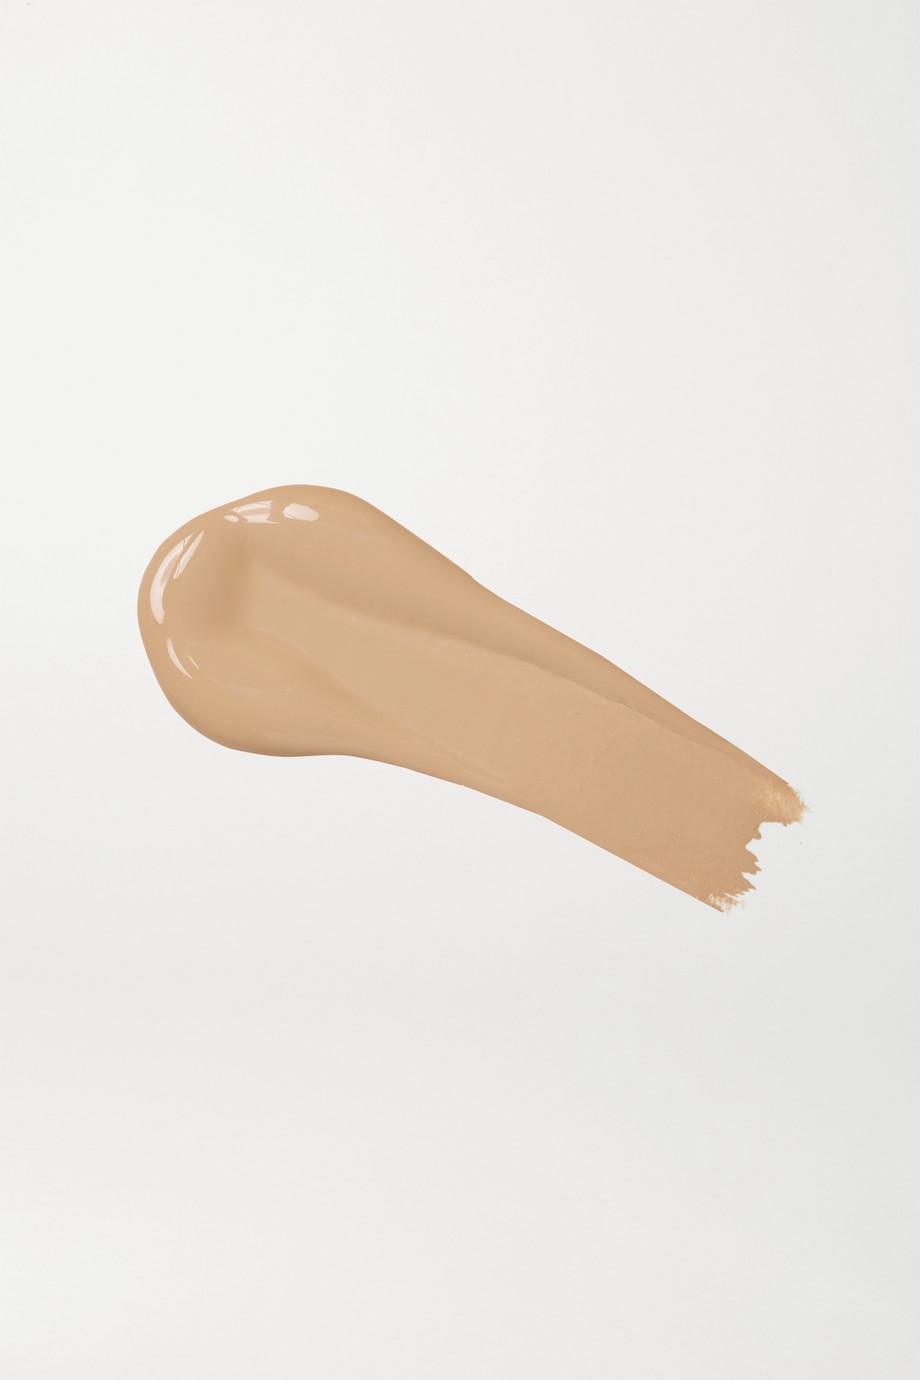 Kosas Revealer Super Creamy + Brightening Concealer - 05